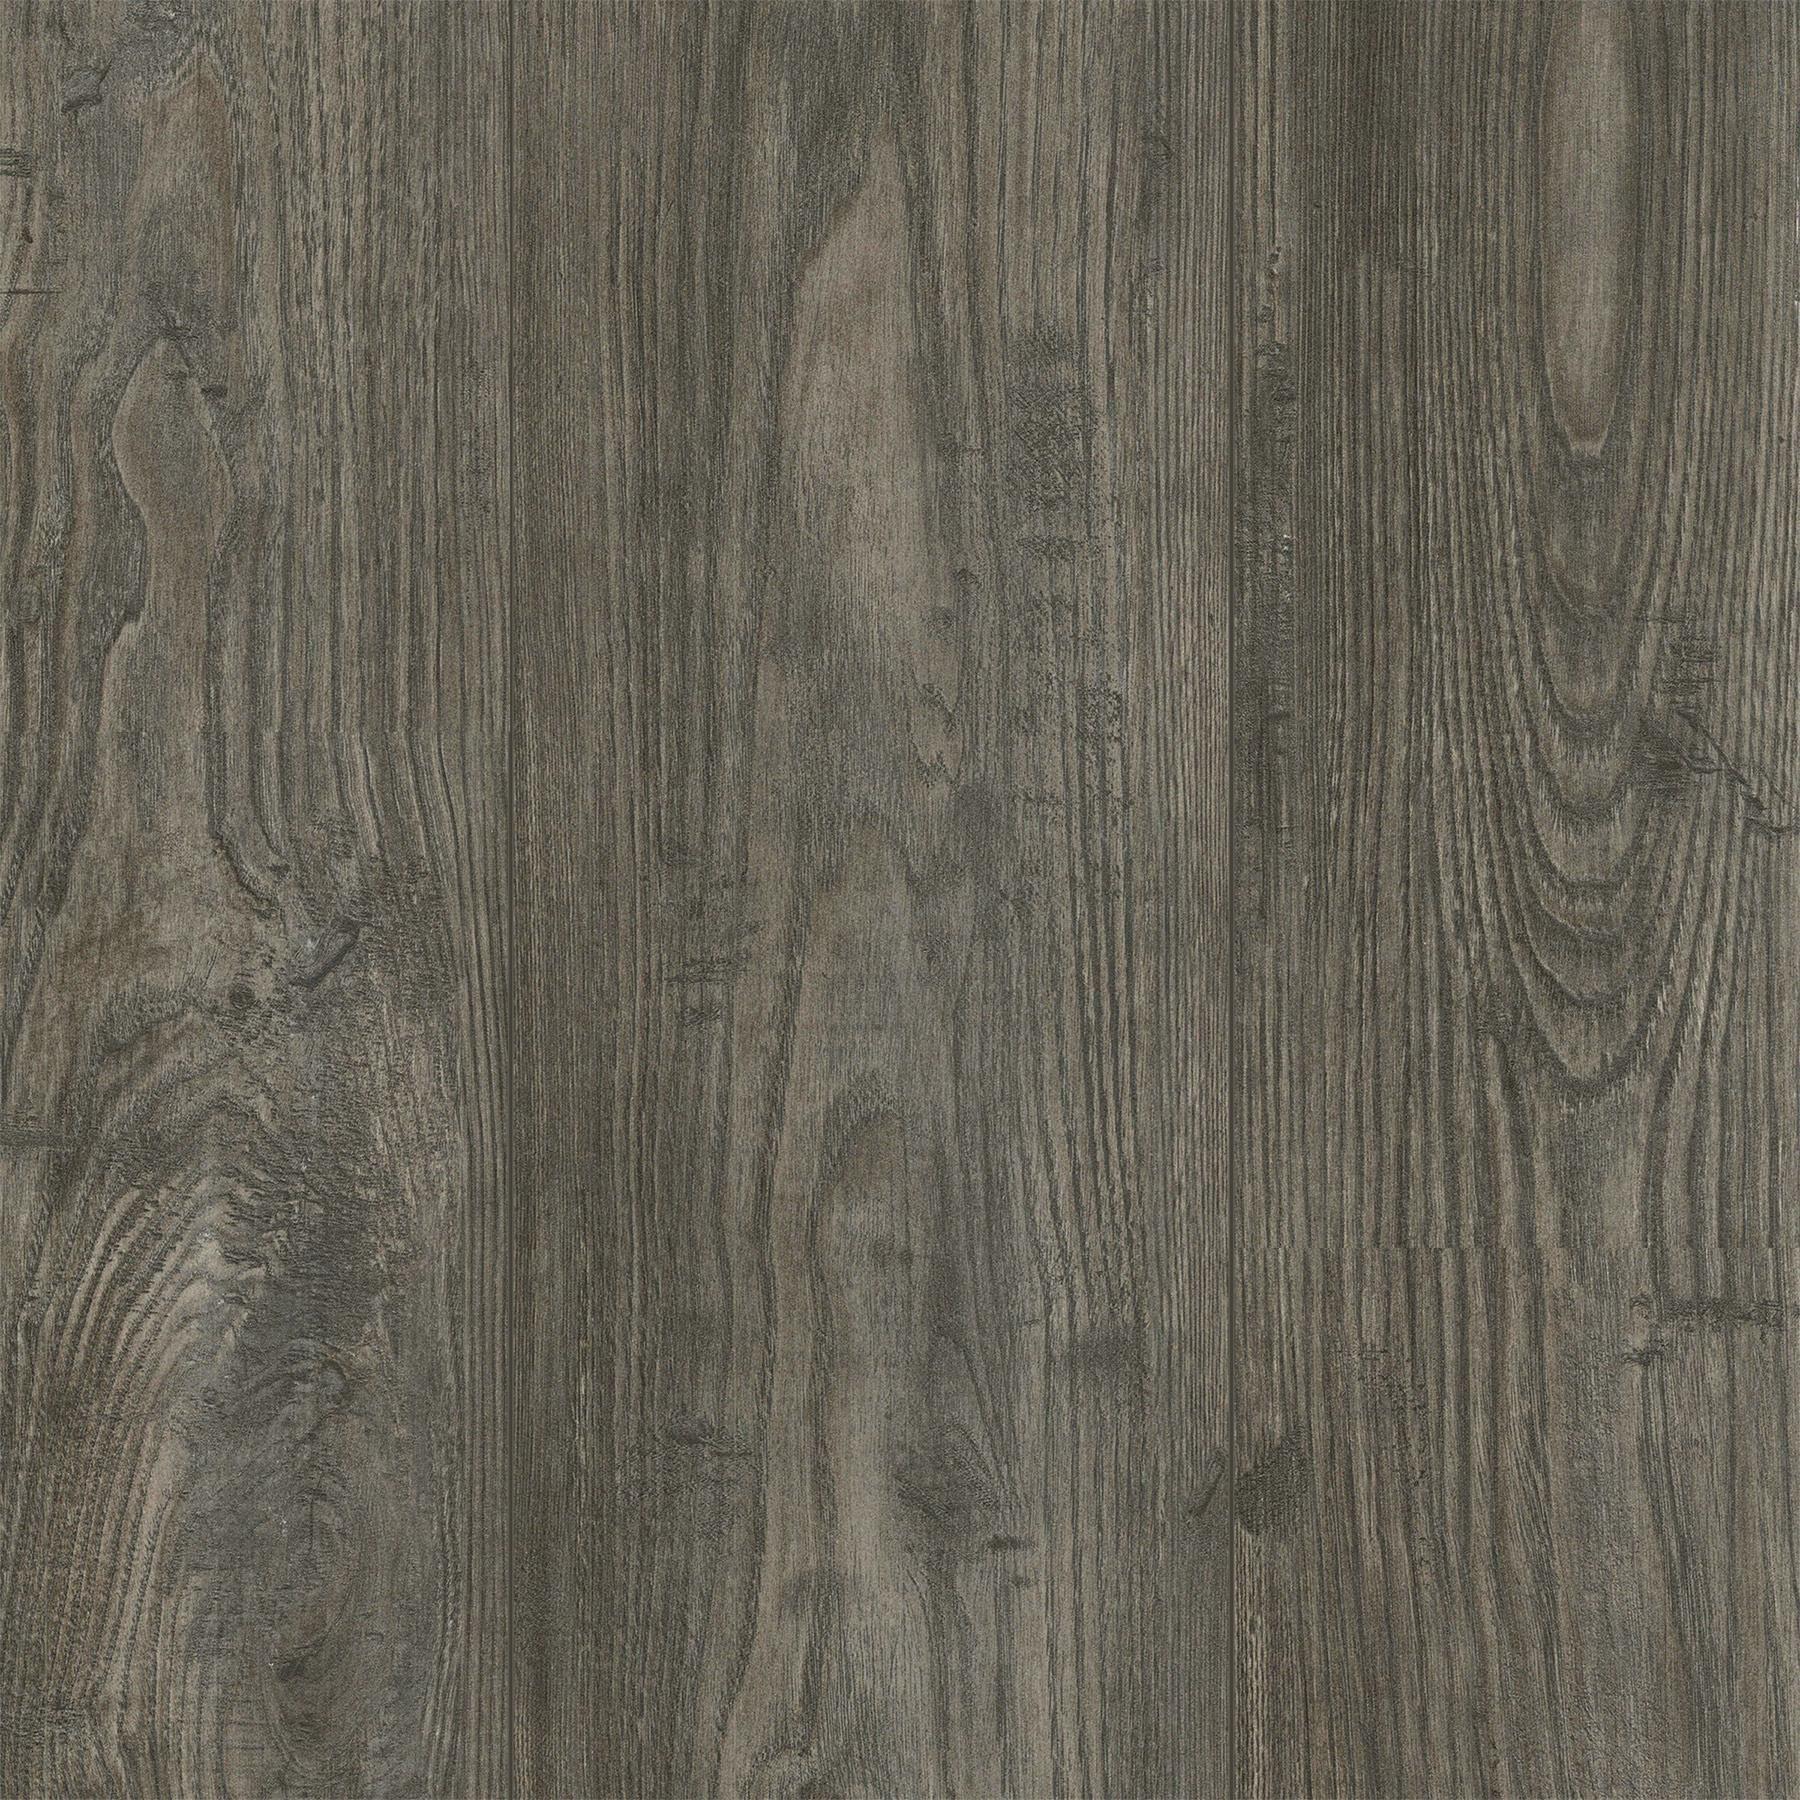 Kronoswiss Infinity Madrid Laminate Flooring